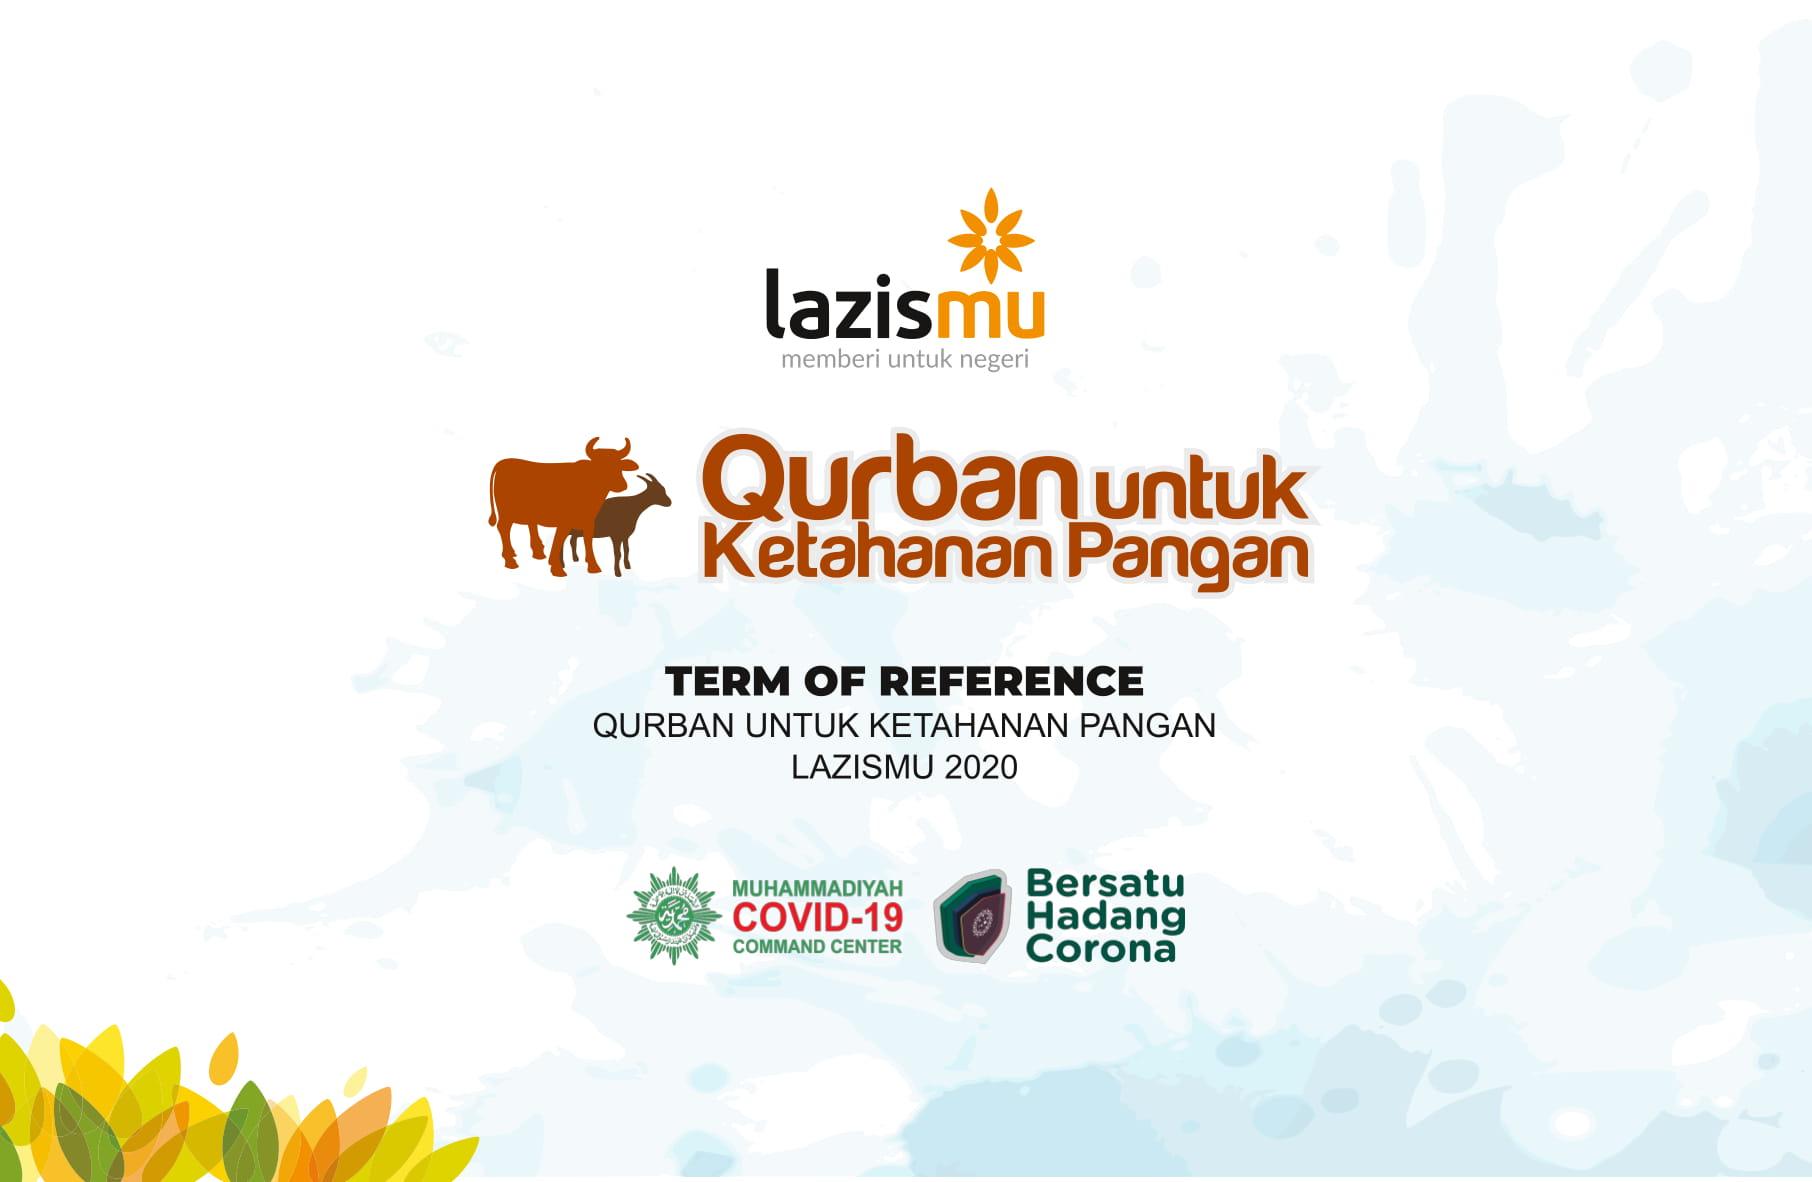 Term of reference Qurban 1441 H Lazismu